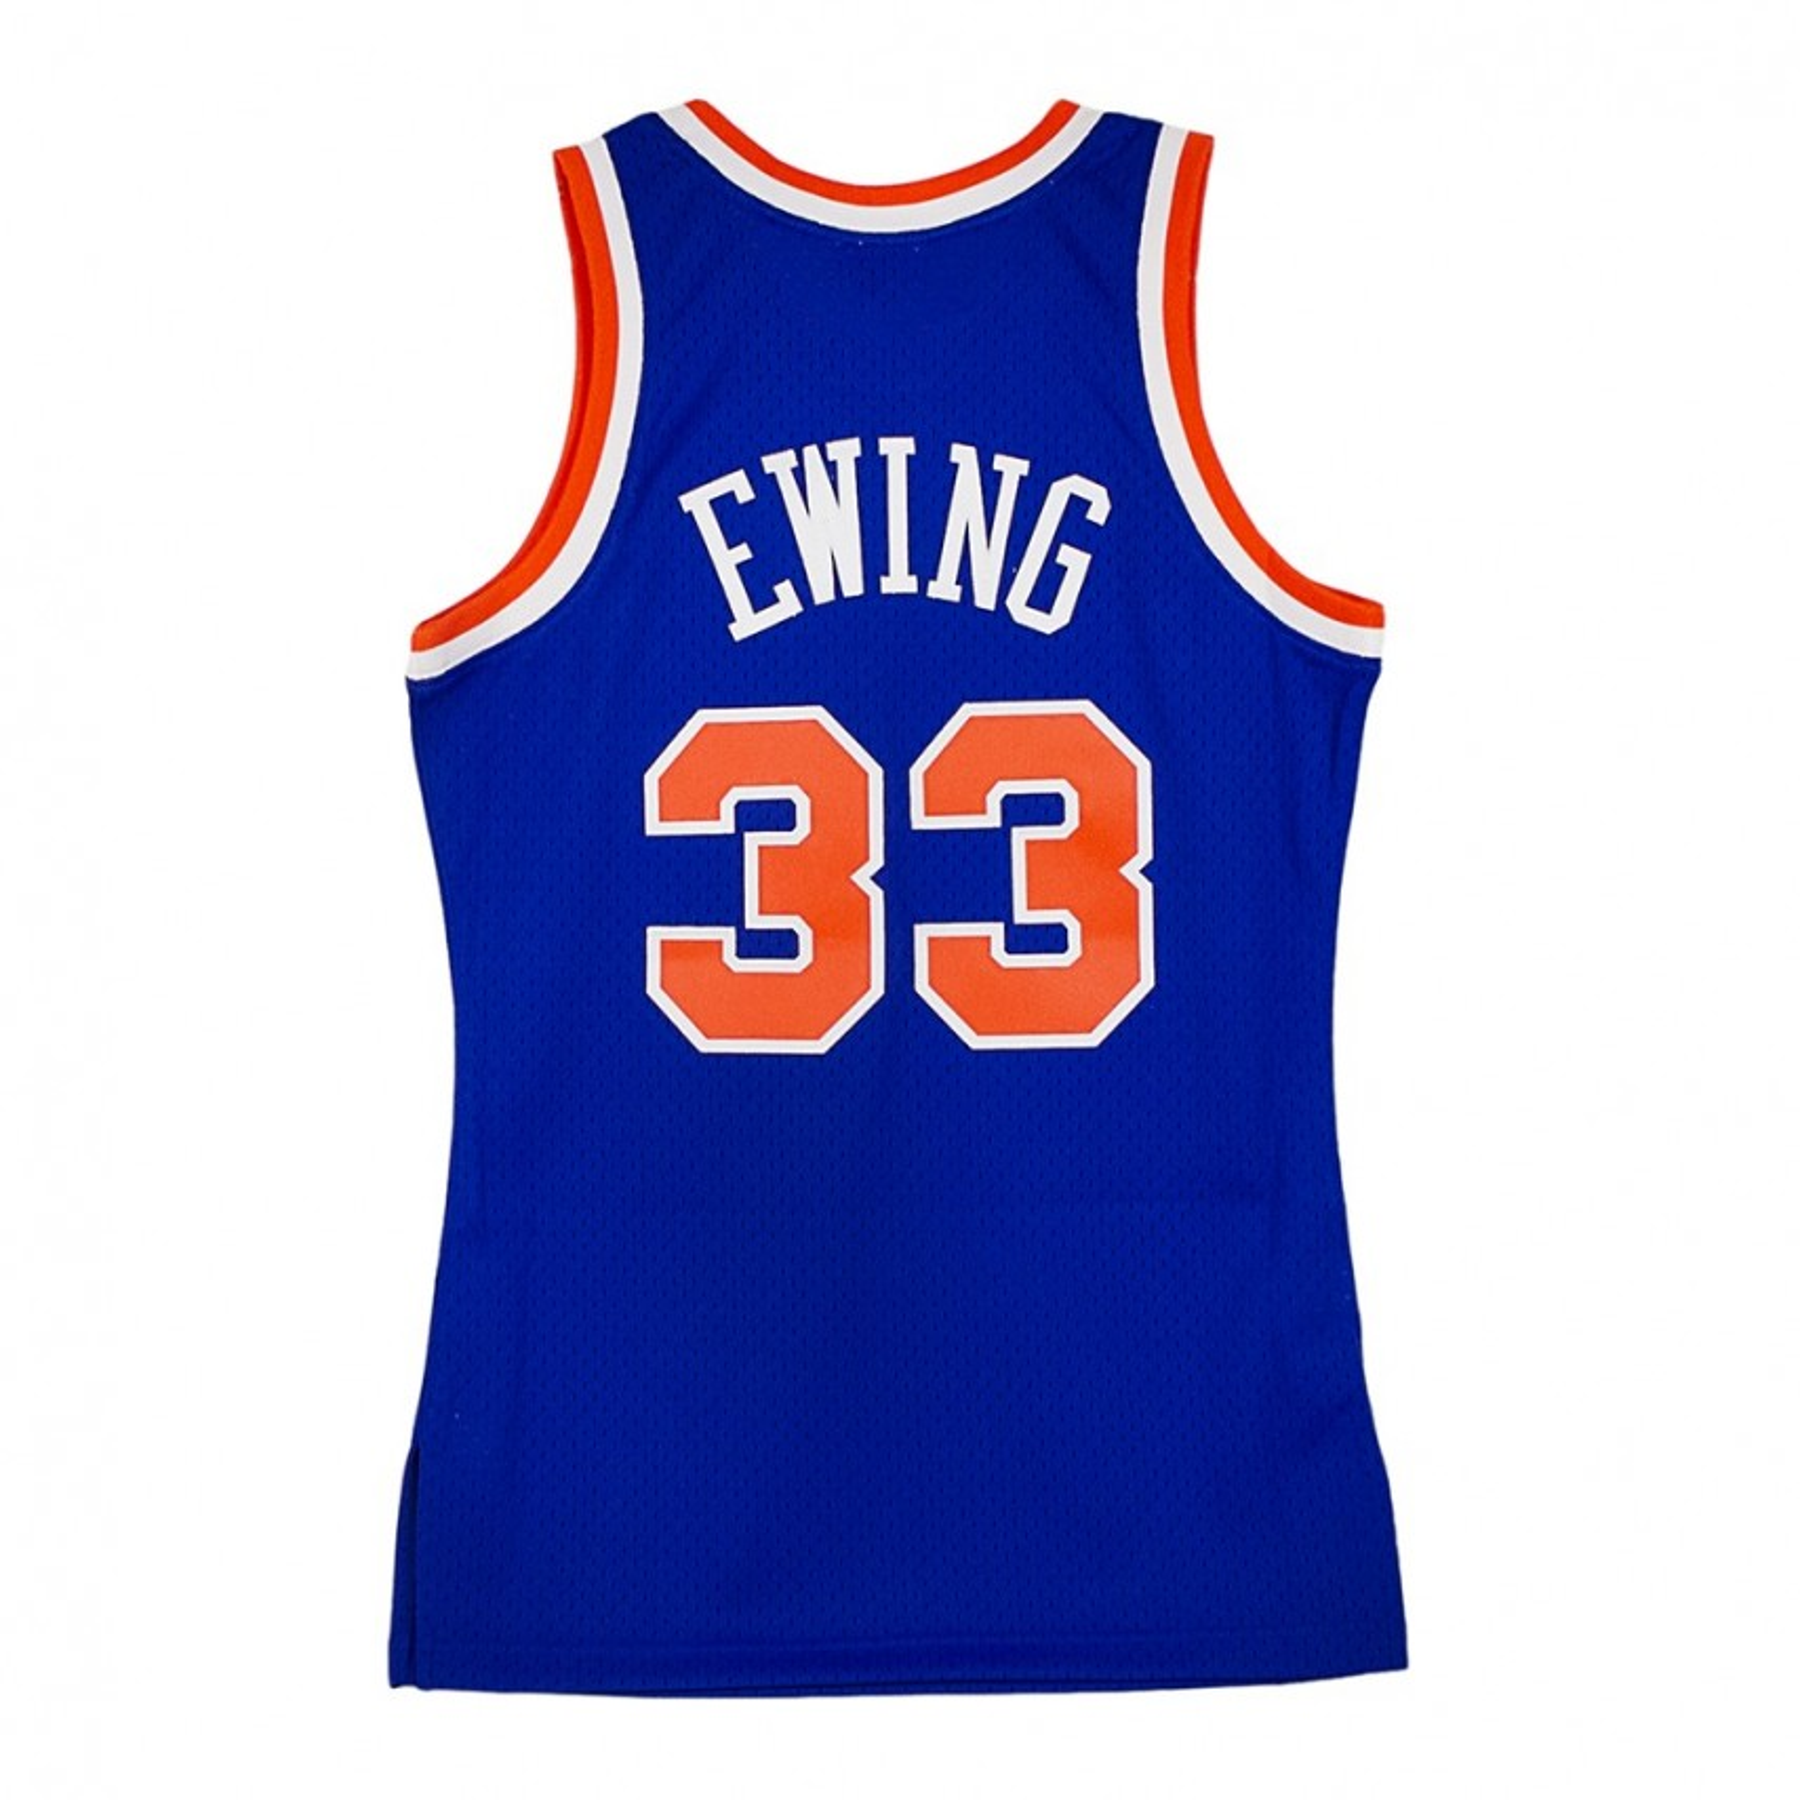 size 40 5982a c8cd0 CANOTTA SWINGMAN JERSEY PATRICK EWING NO33 NEYKNI BLUE/ORANGE